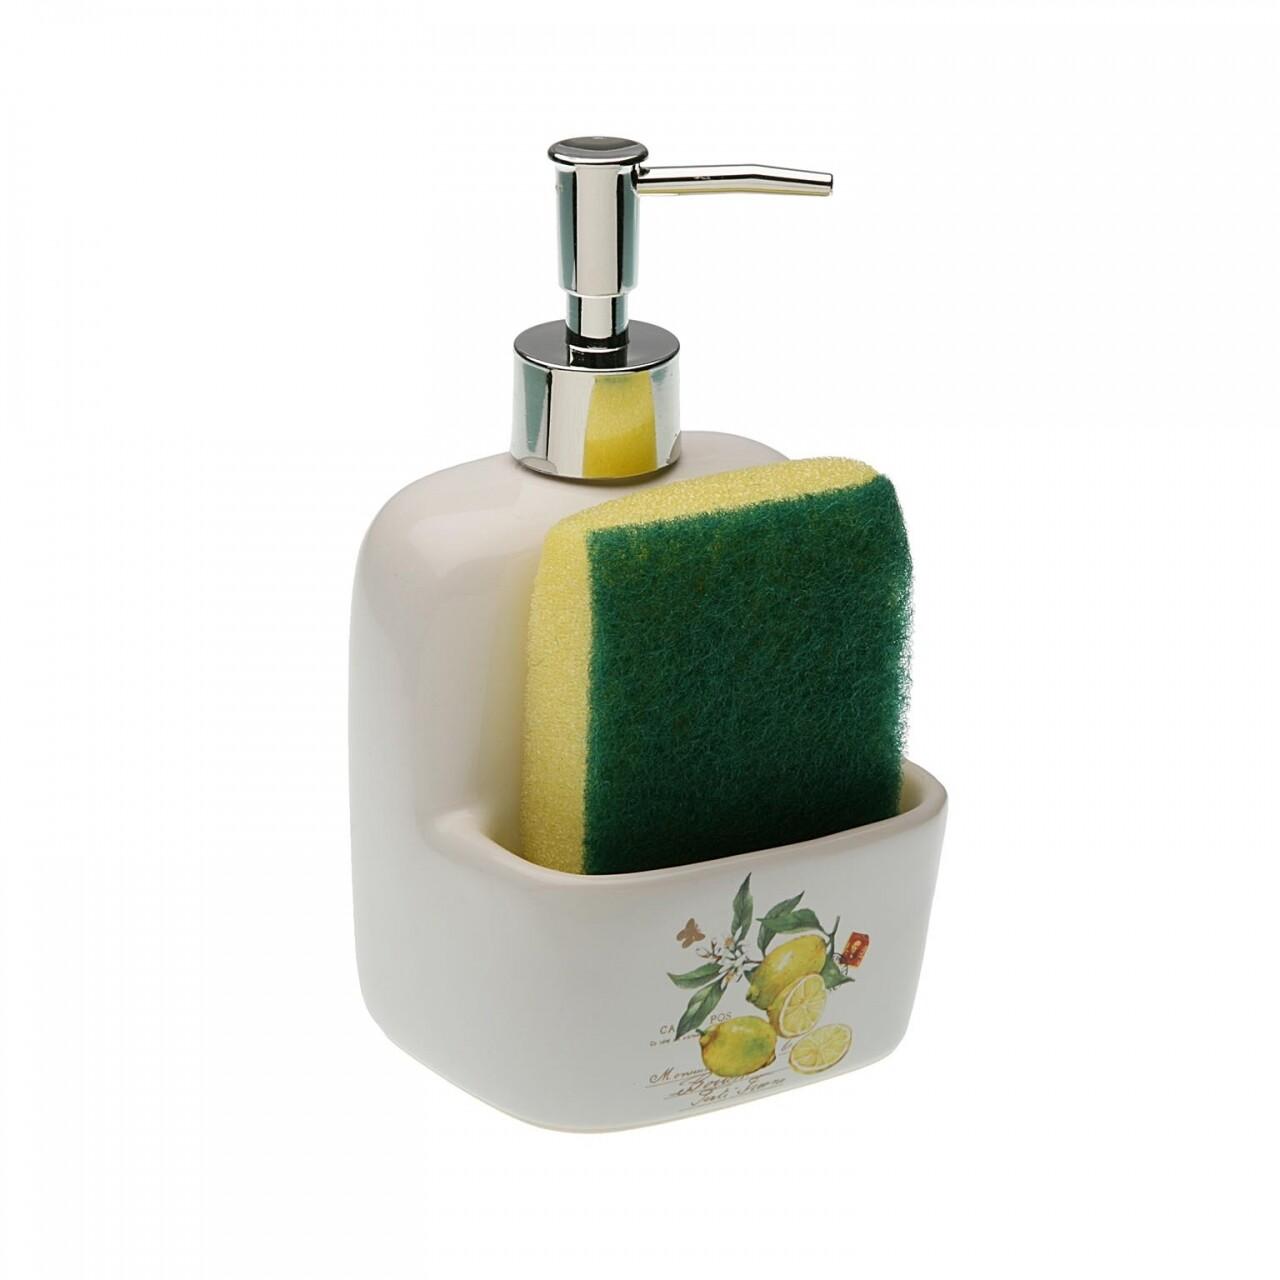 Dozator de săpun Lemons